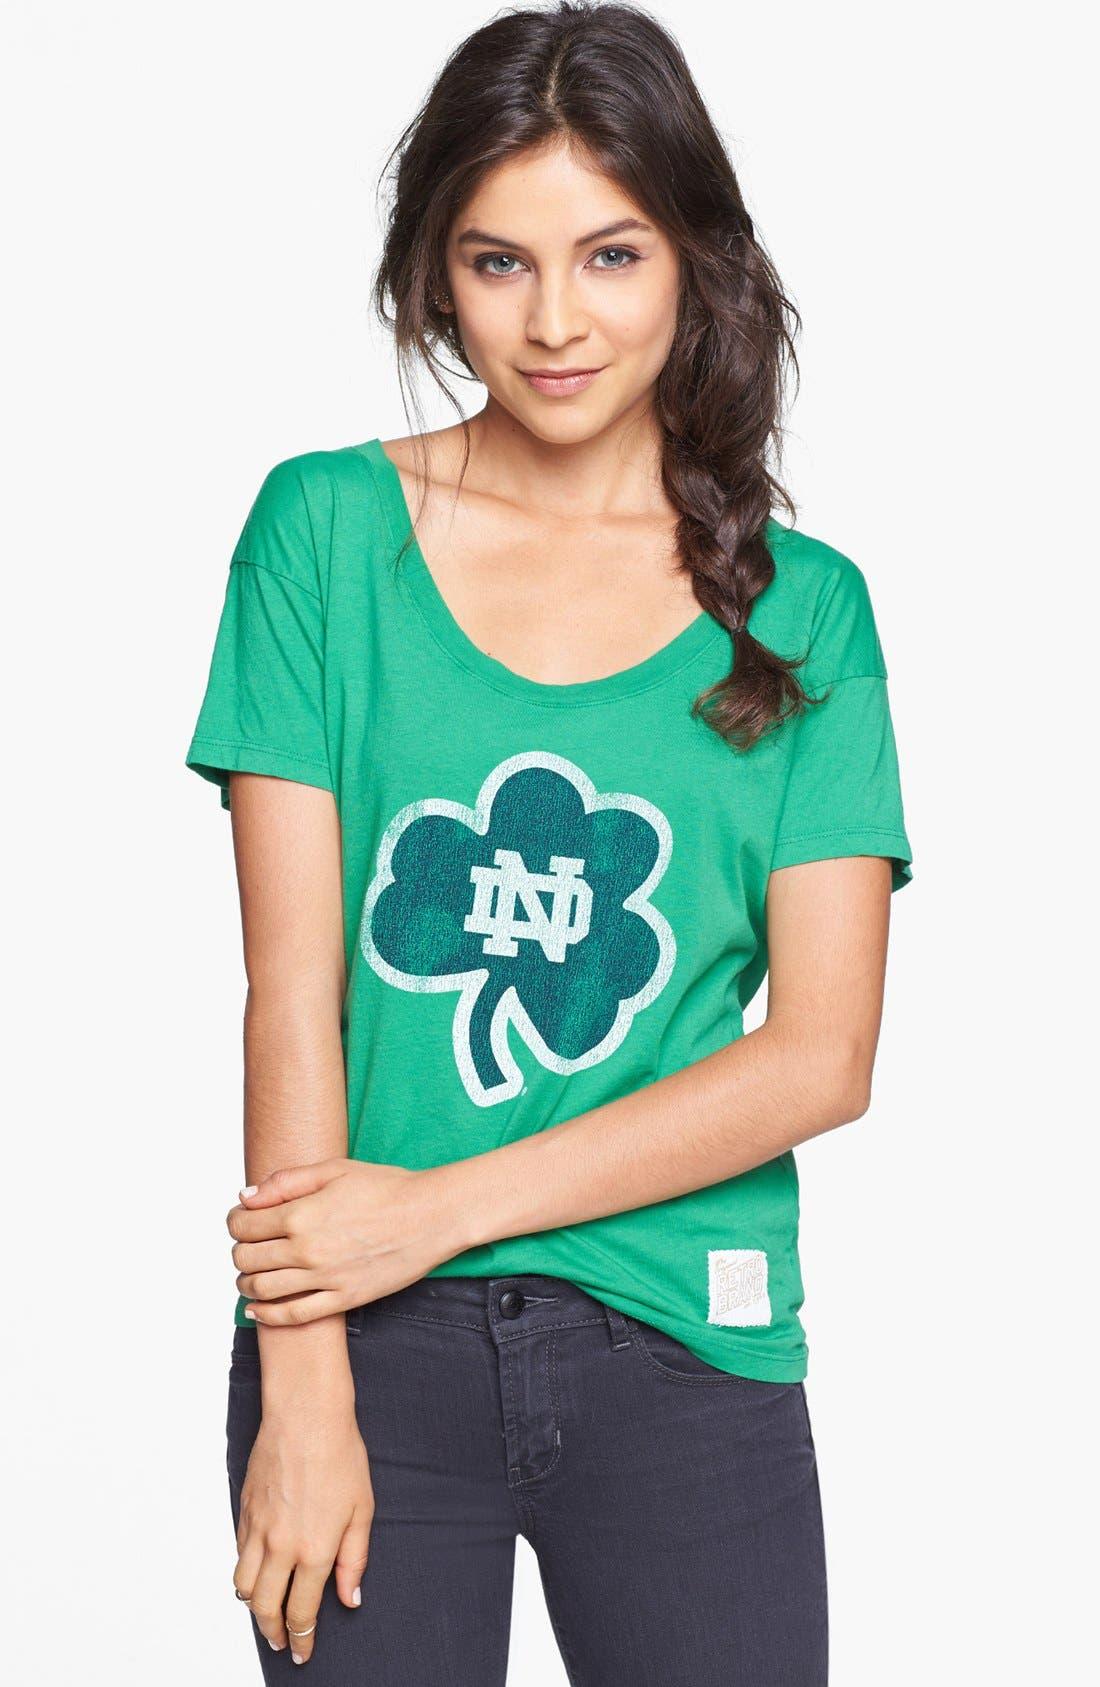 Alternate Image 1 Selected - Retro Brand 'University of Notre Dame Fighting Irish' Graphic Tee (Juniors)